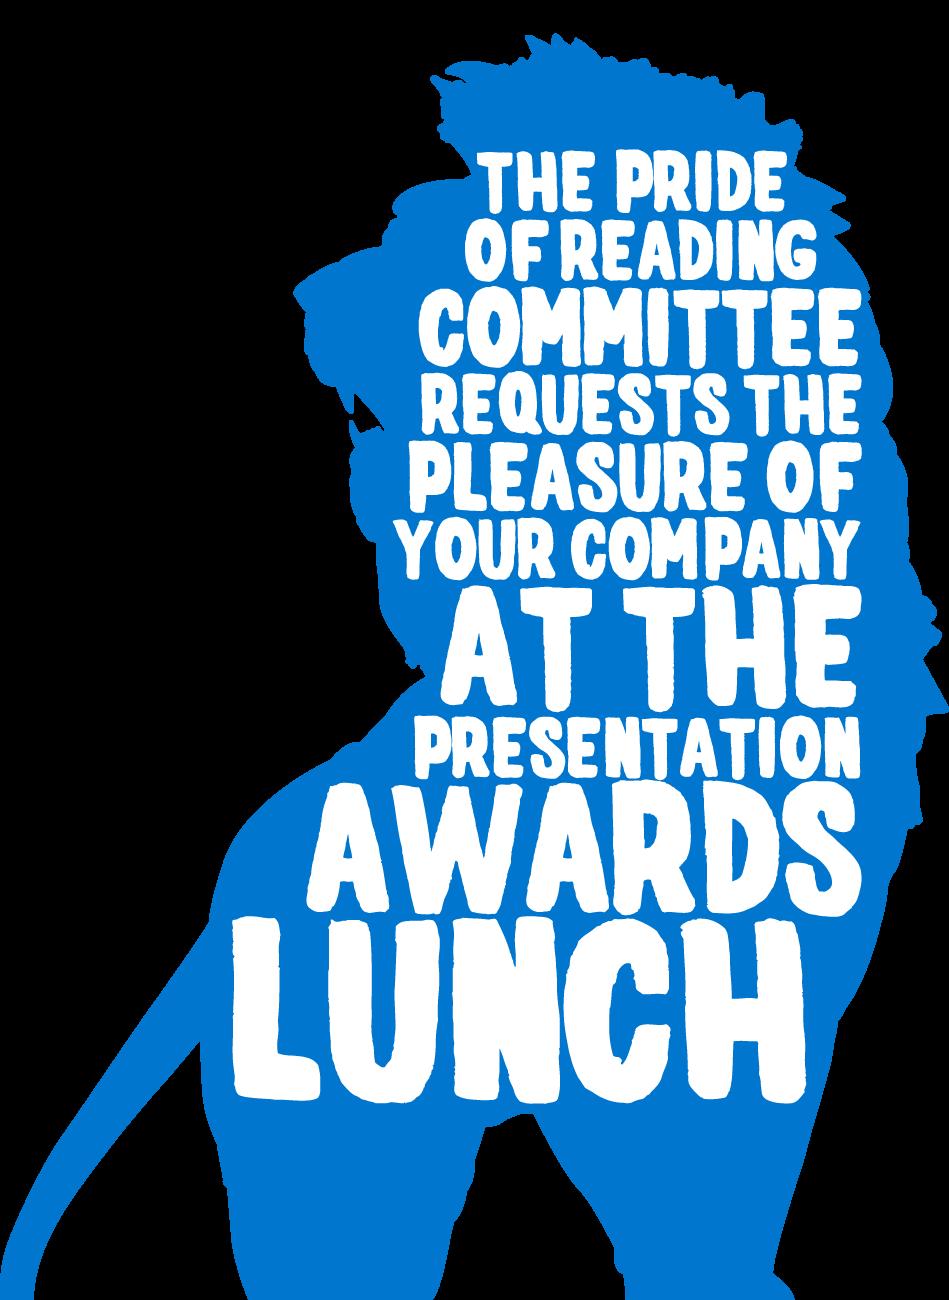 Pride of Reading Awards 2015 Invitation